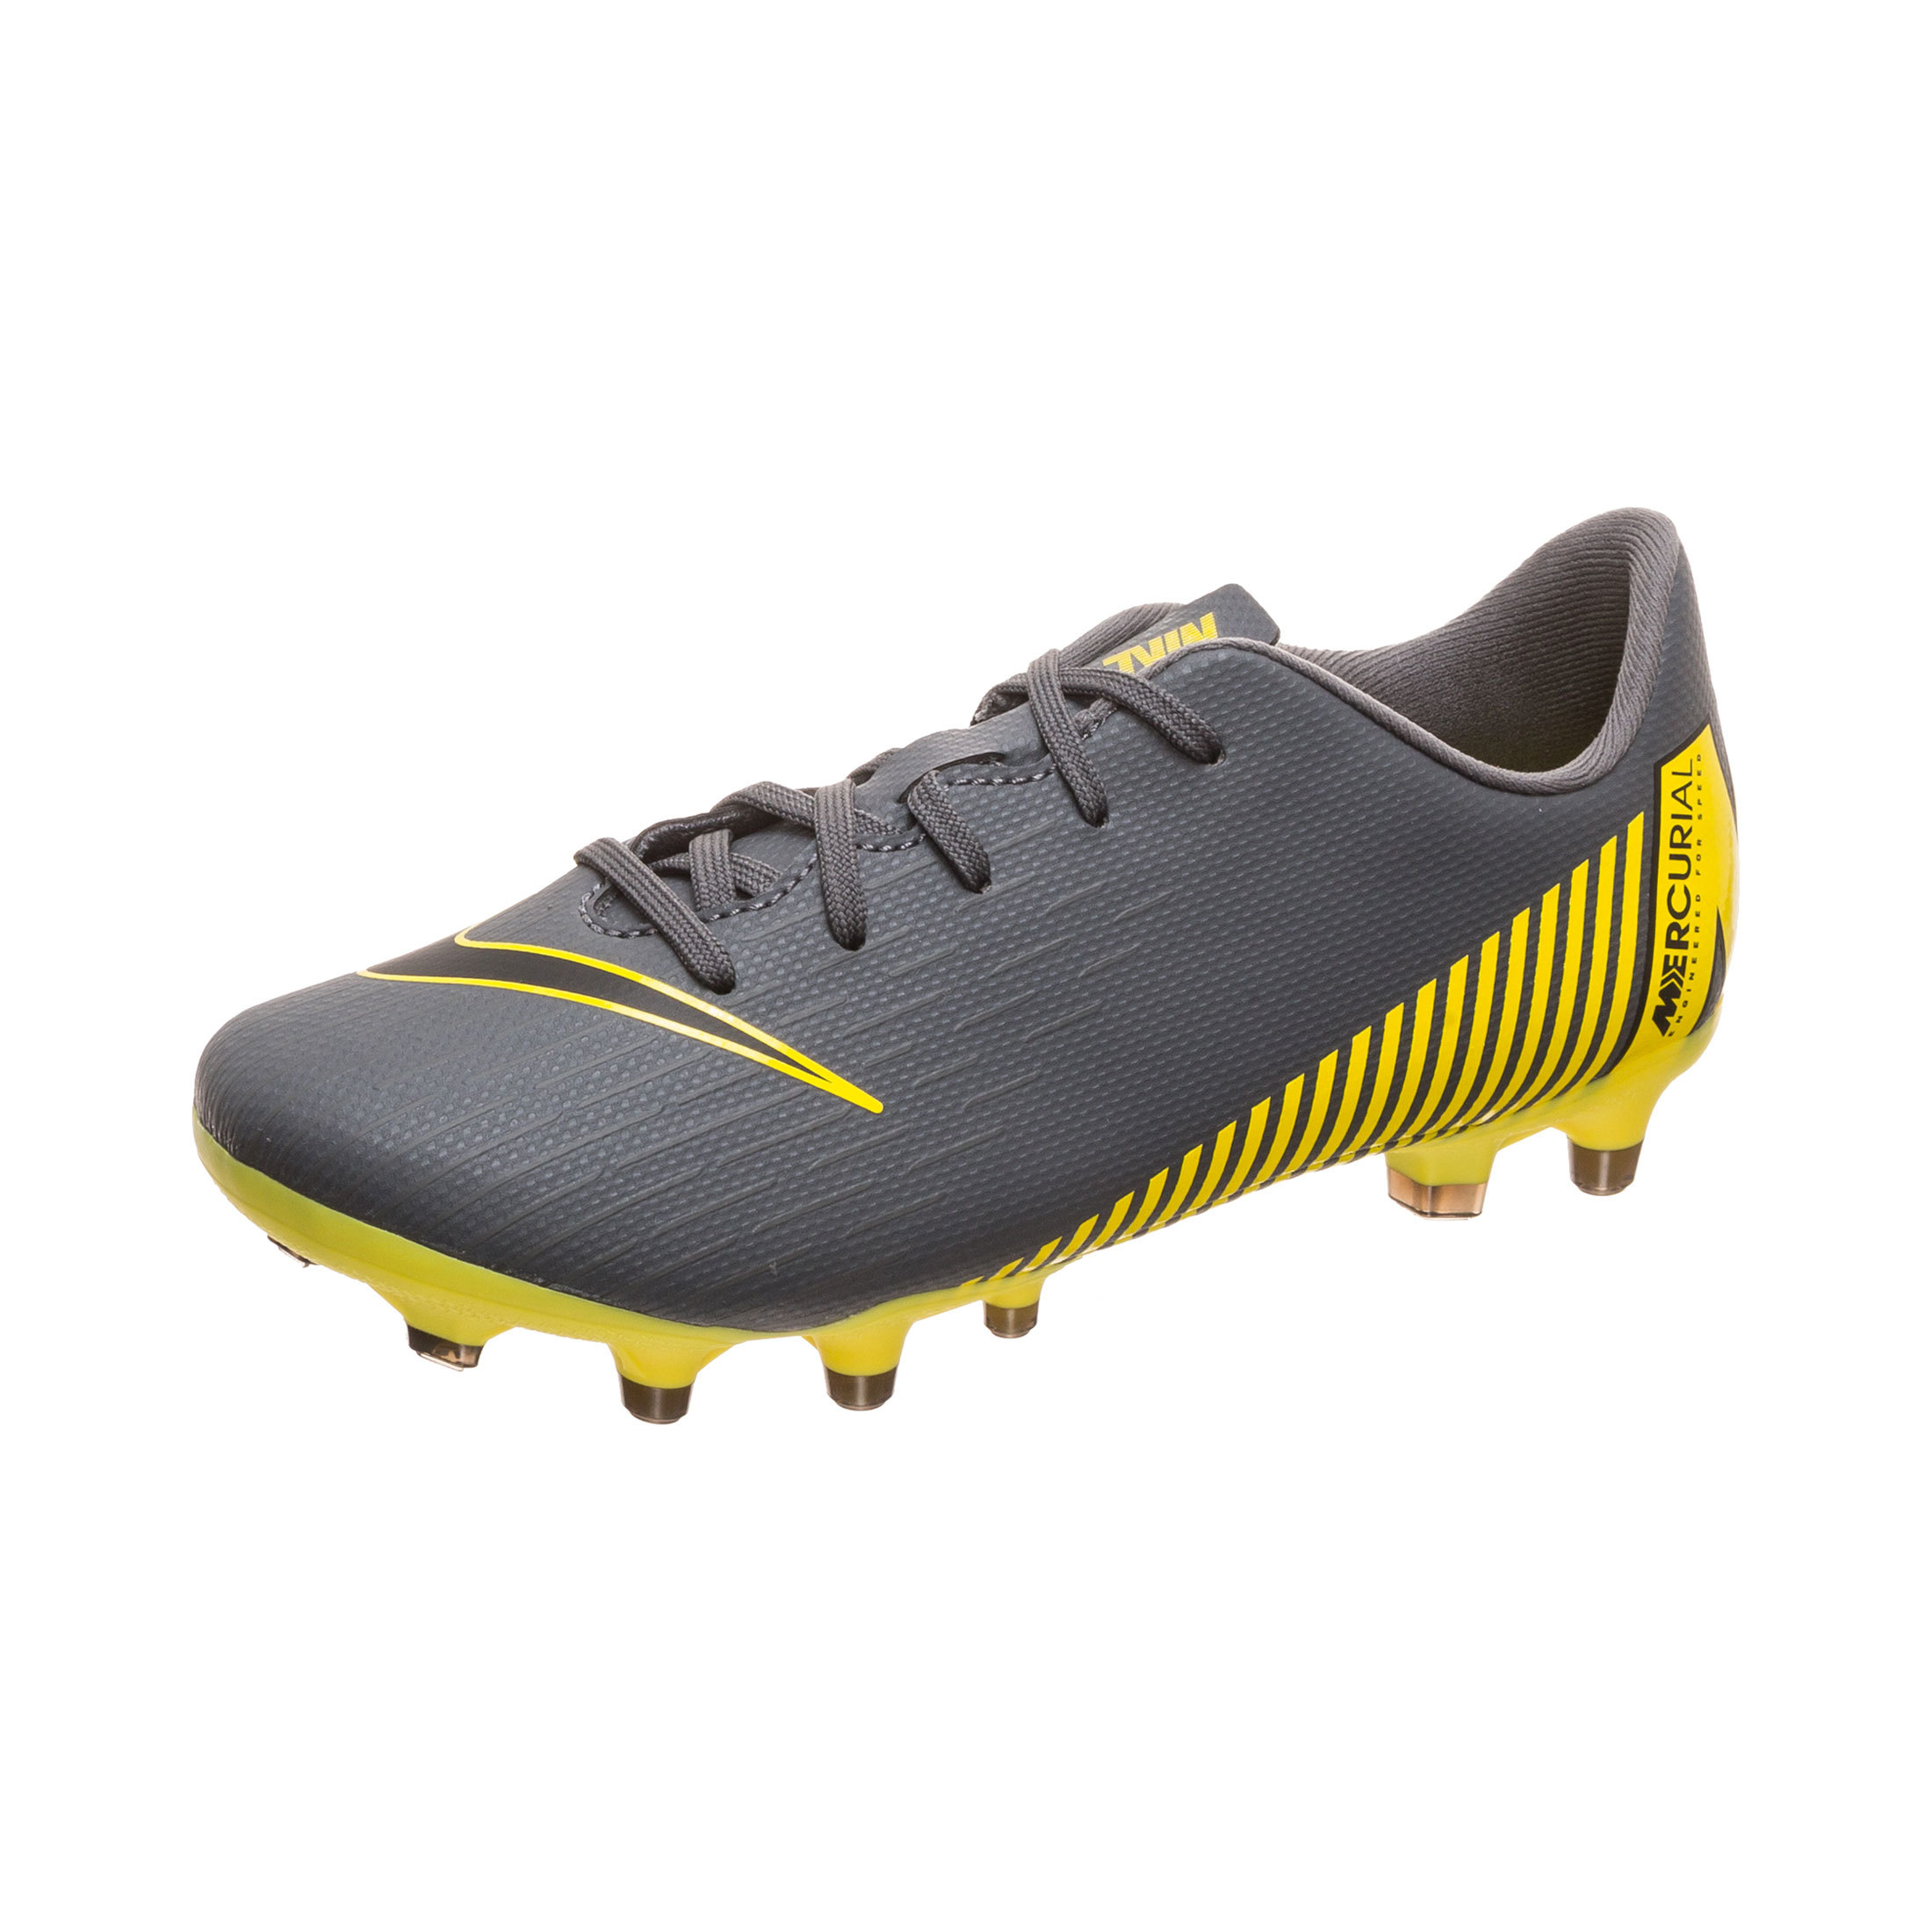 eb0b9556d62 Kids Laceless Football Boots